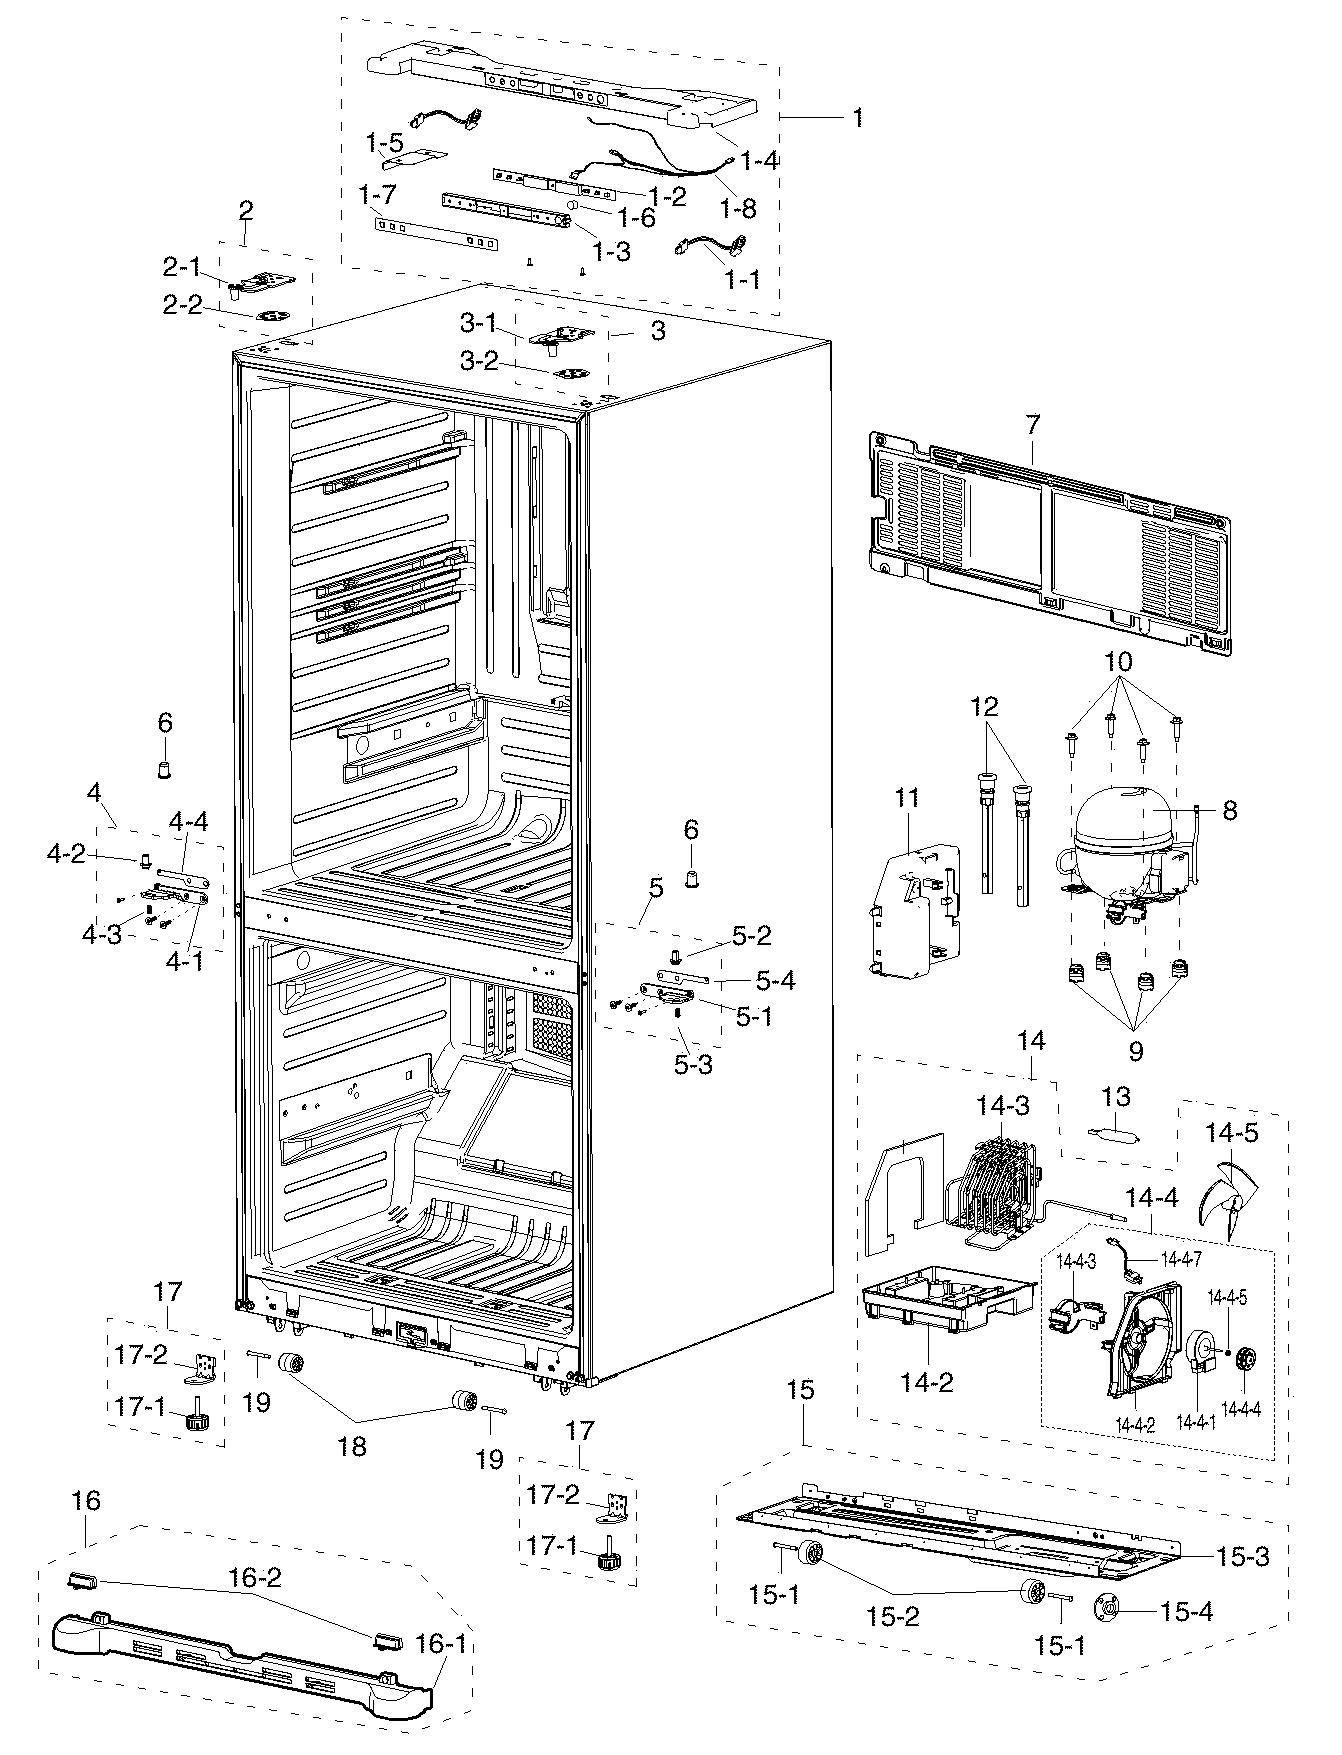 samsung frost free refrigerator wiring diagram